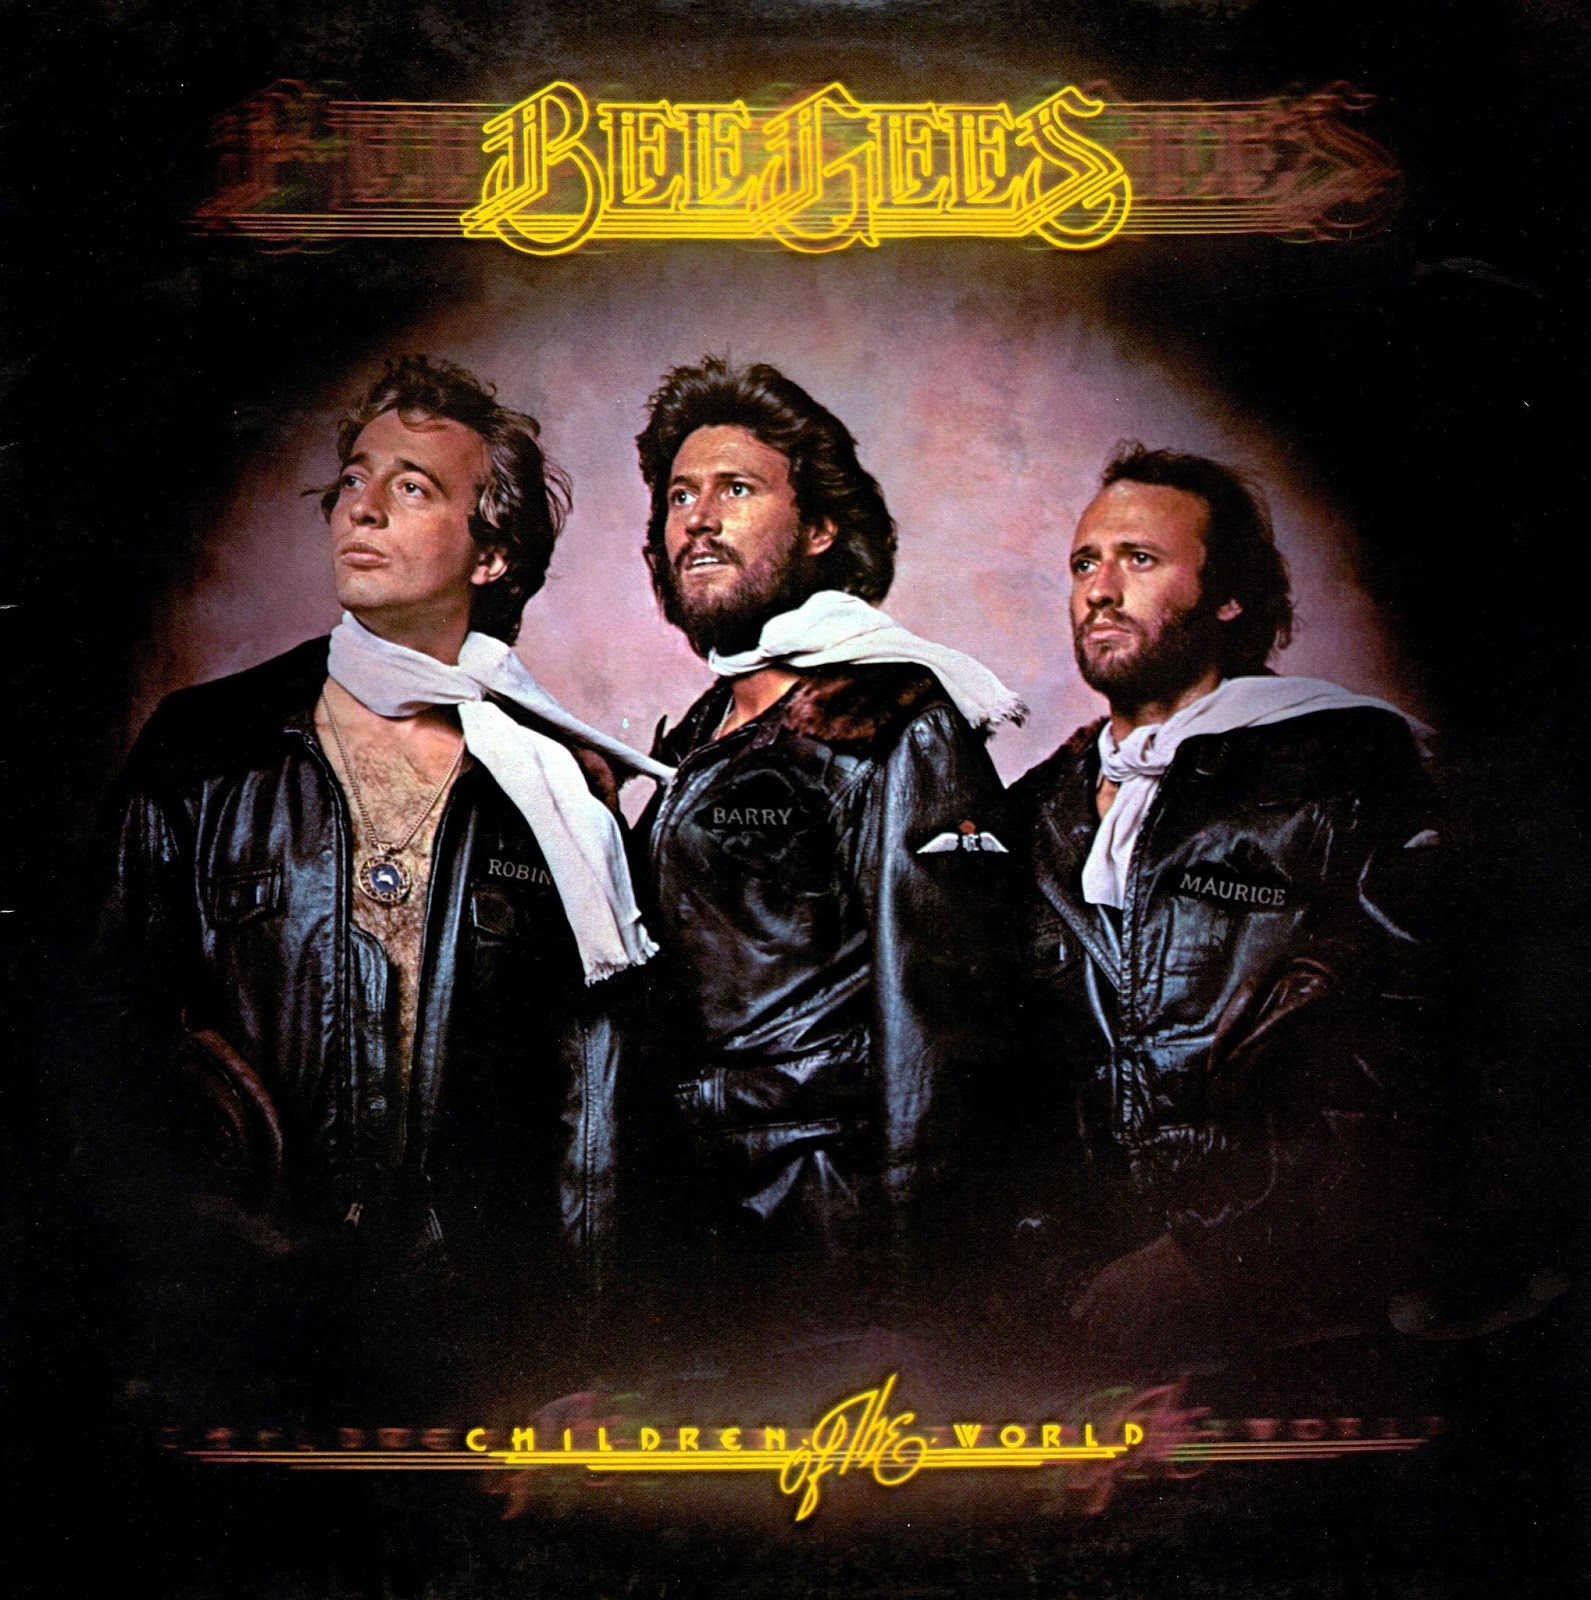 Discográfia Completa de Bee Gees (MEGA)